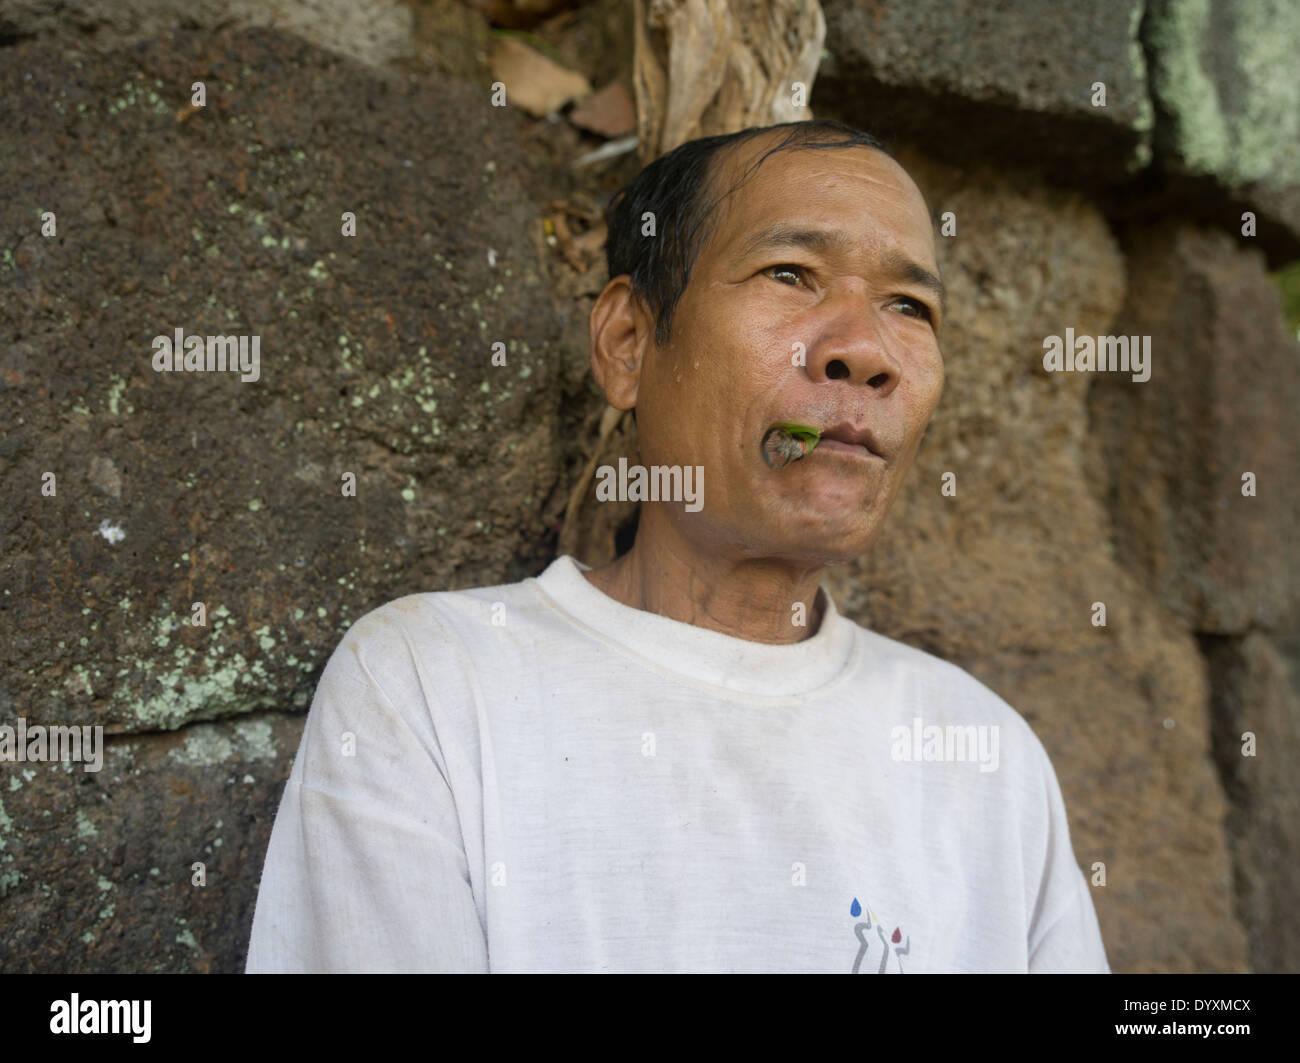 Camobdian man smoking a leaf cigar at Prasat Thom the principal monument of Koh Ker 127 NE of Siem Reap, Cambodia - Stock Image